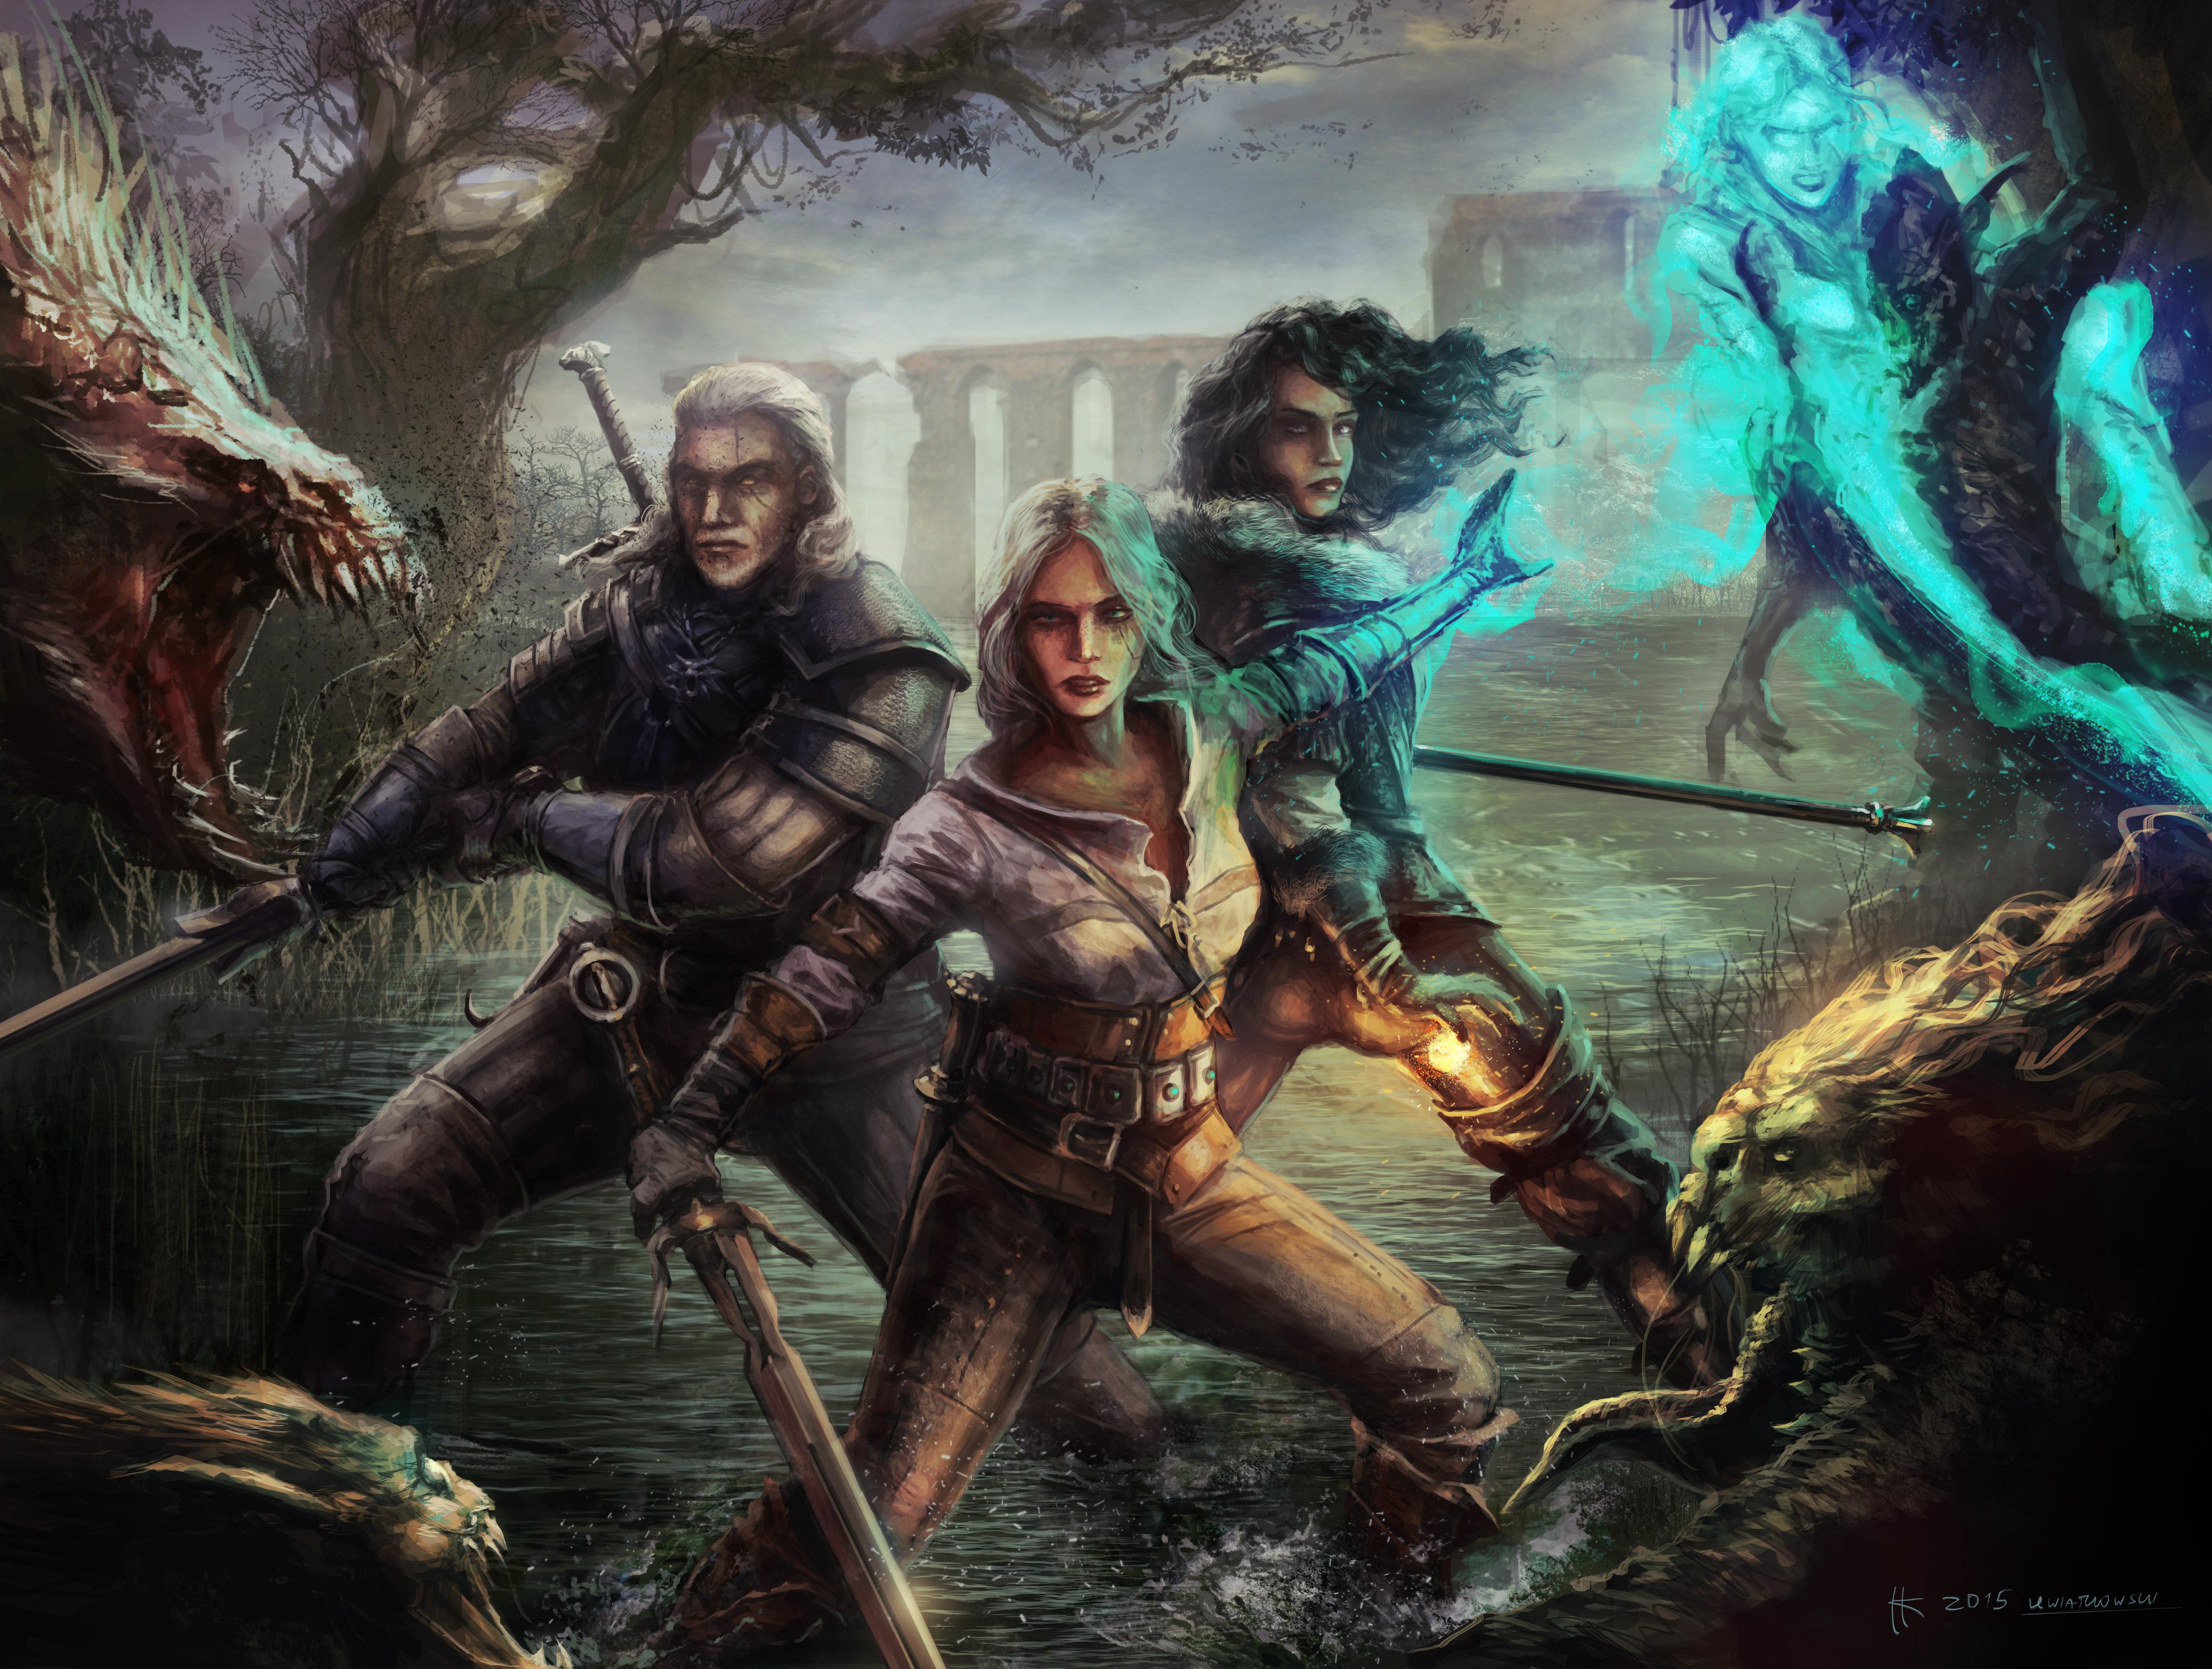 The Witcher 3 Wallpaper 4k: Witcher 3 Wild Hunt Geralt Yen And Ciri, HD Games, 4k